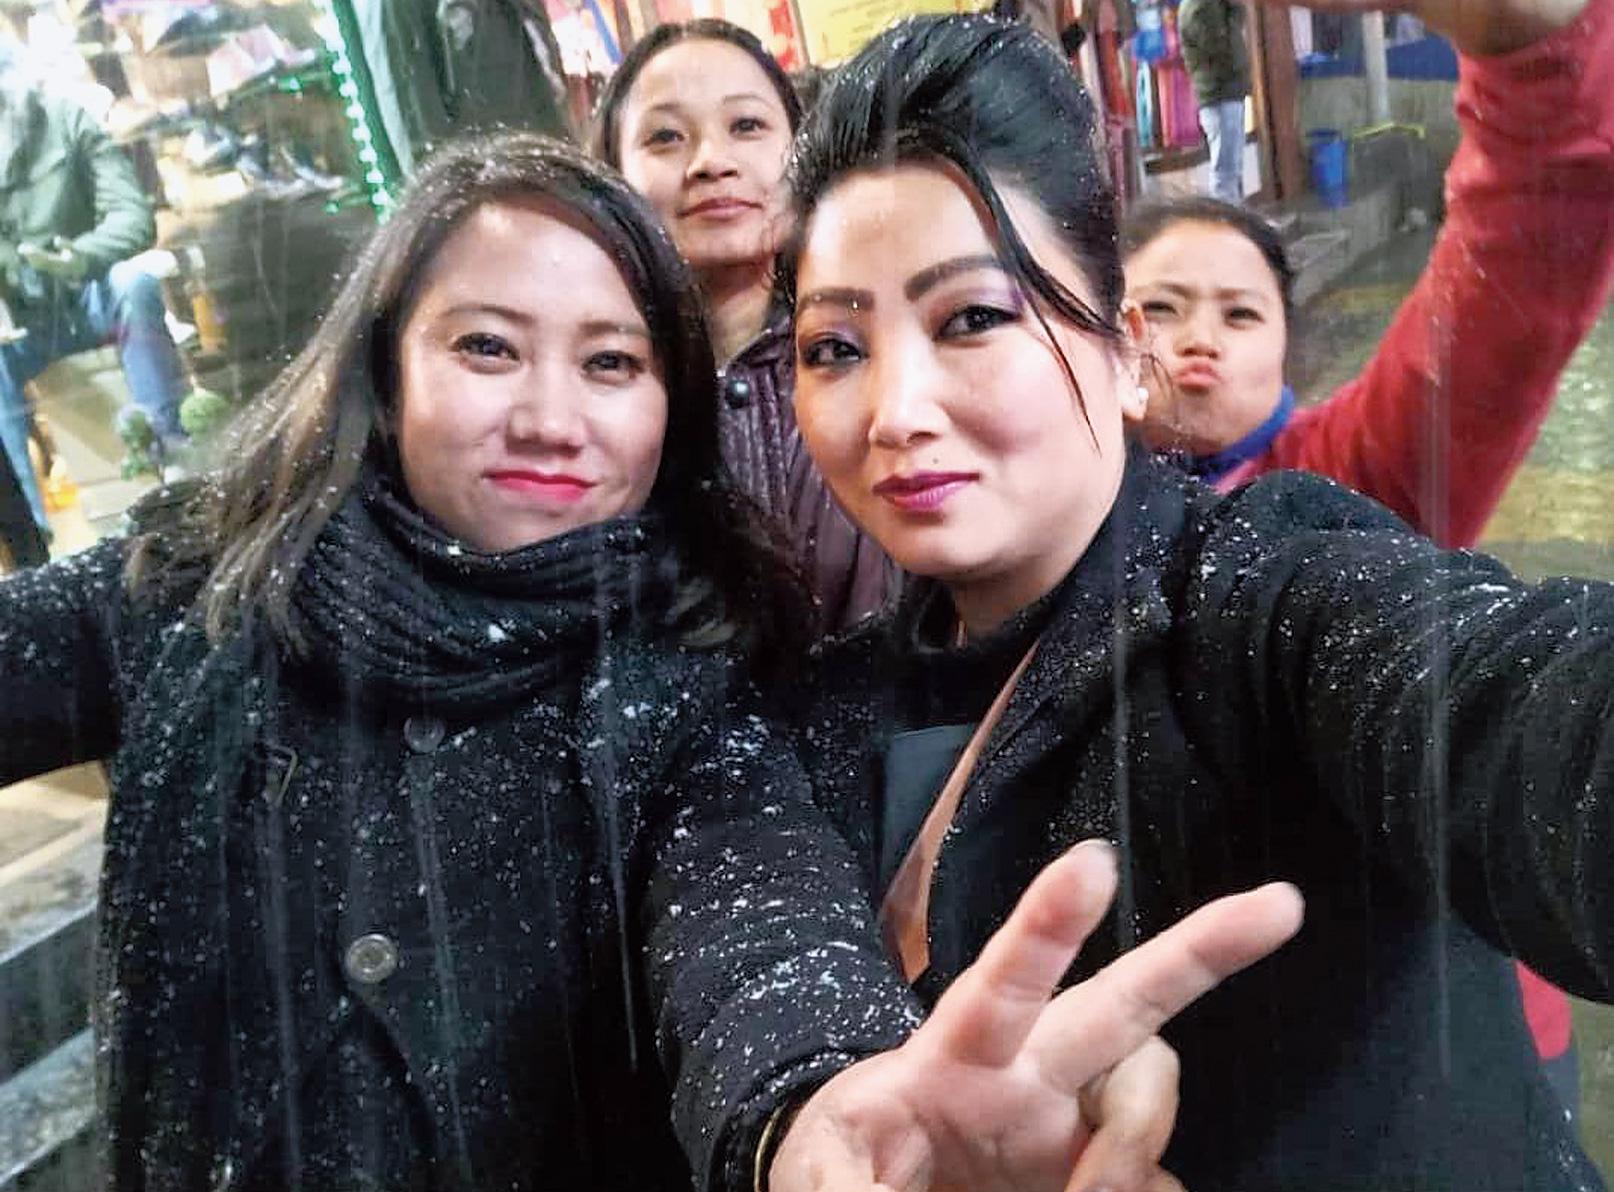 Girls click a selfie during the snowfall in Darjeeling.